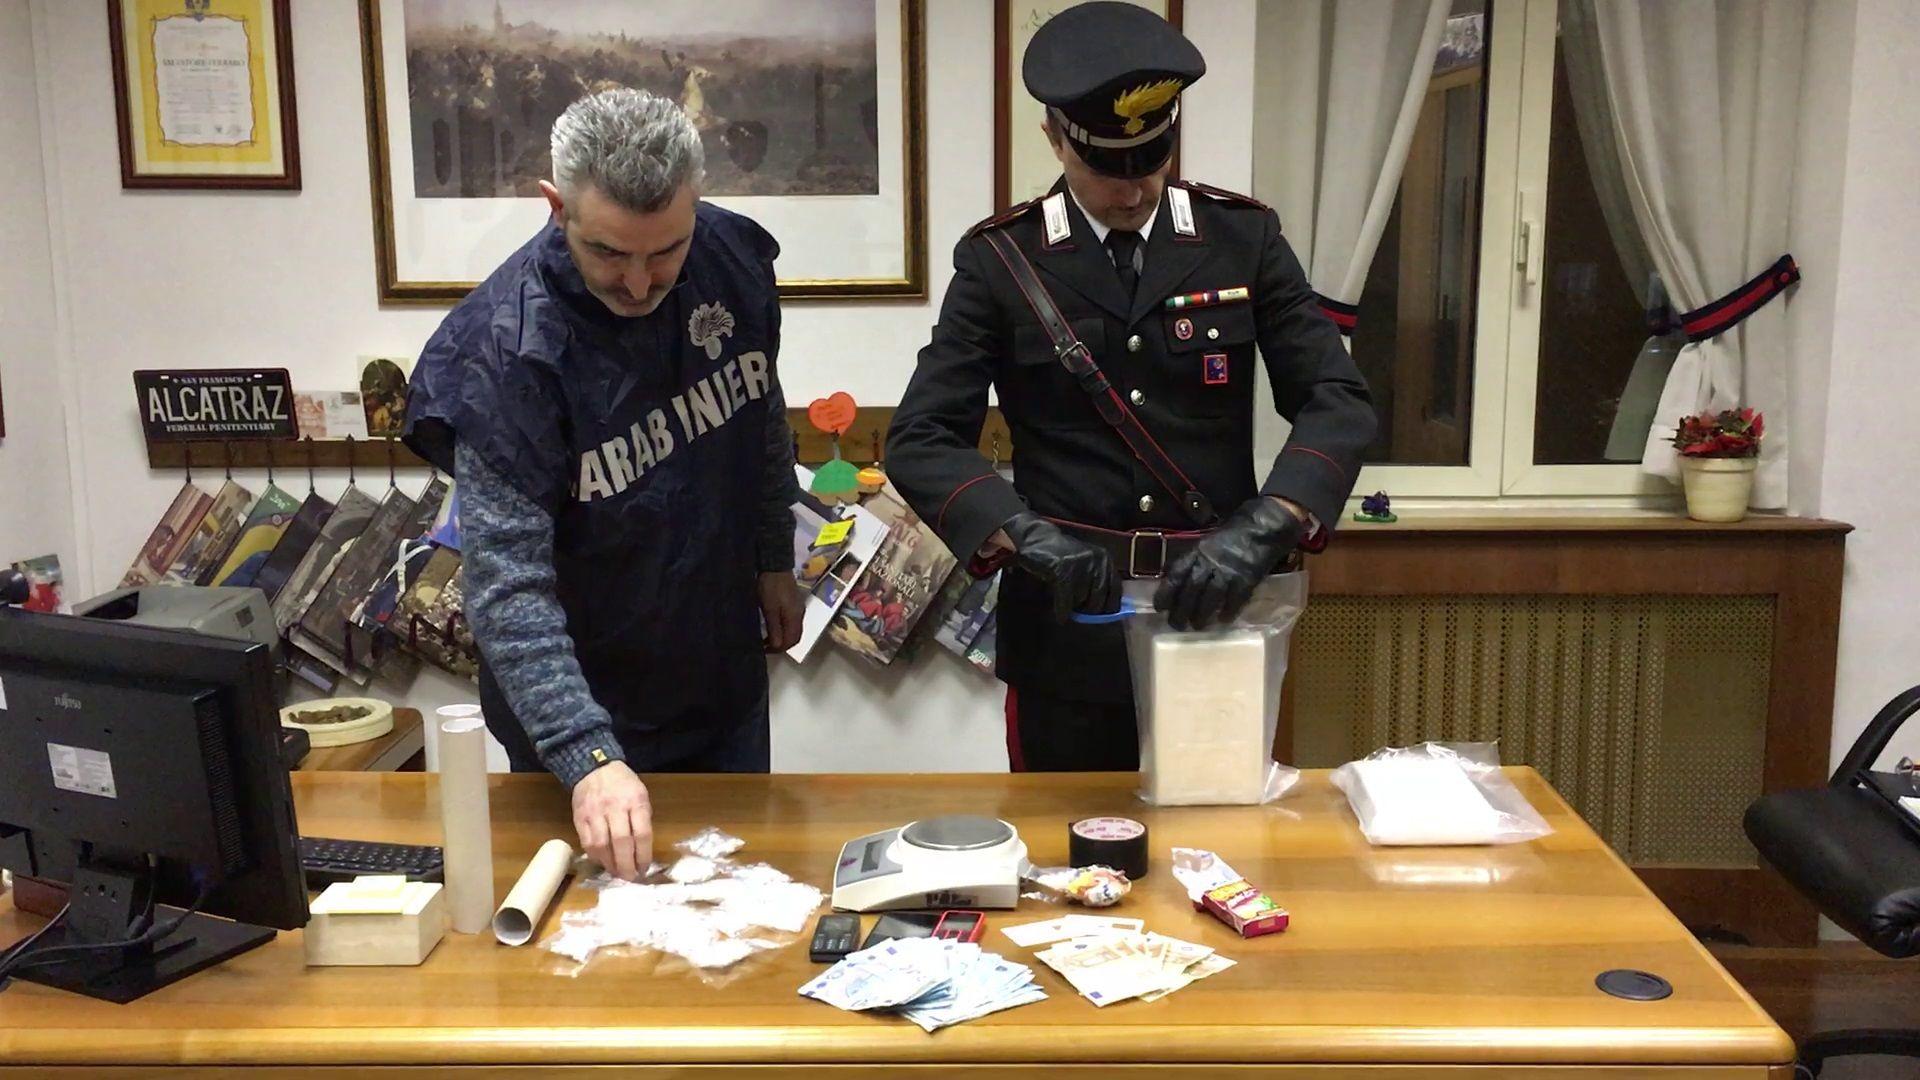 monterotondo droga cocaina carabinieri